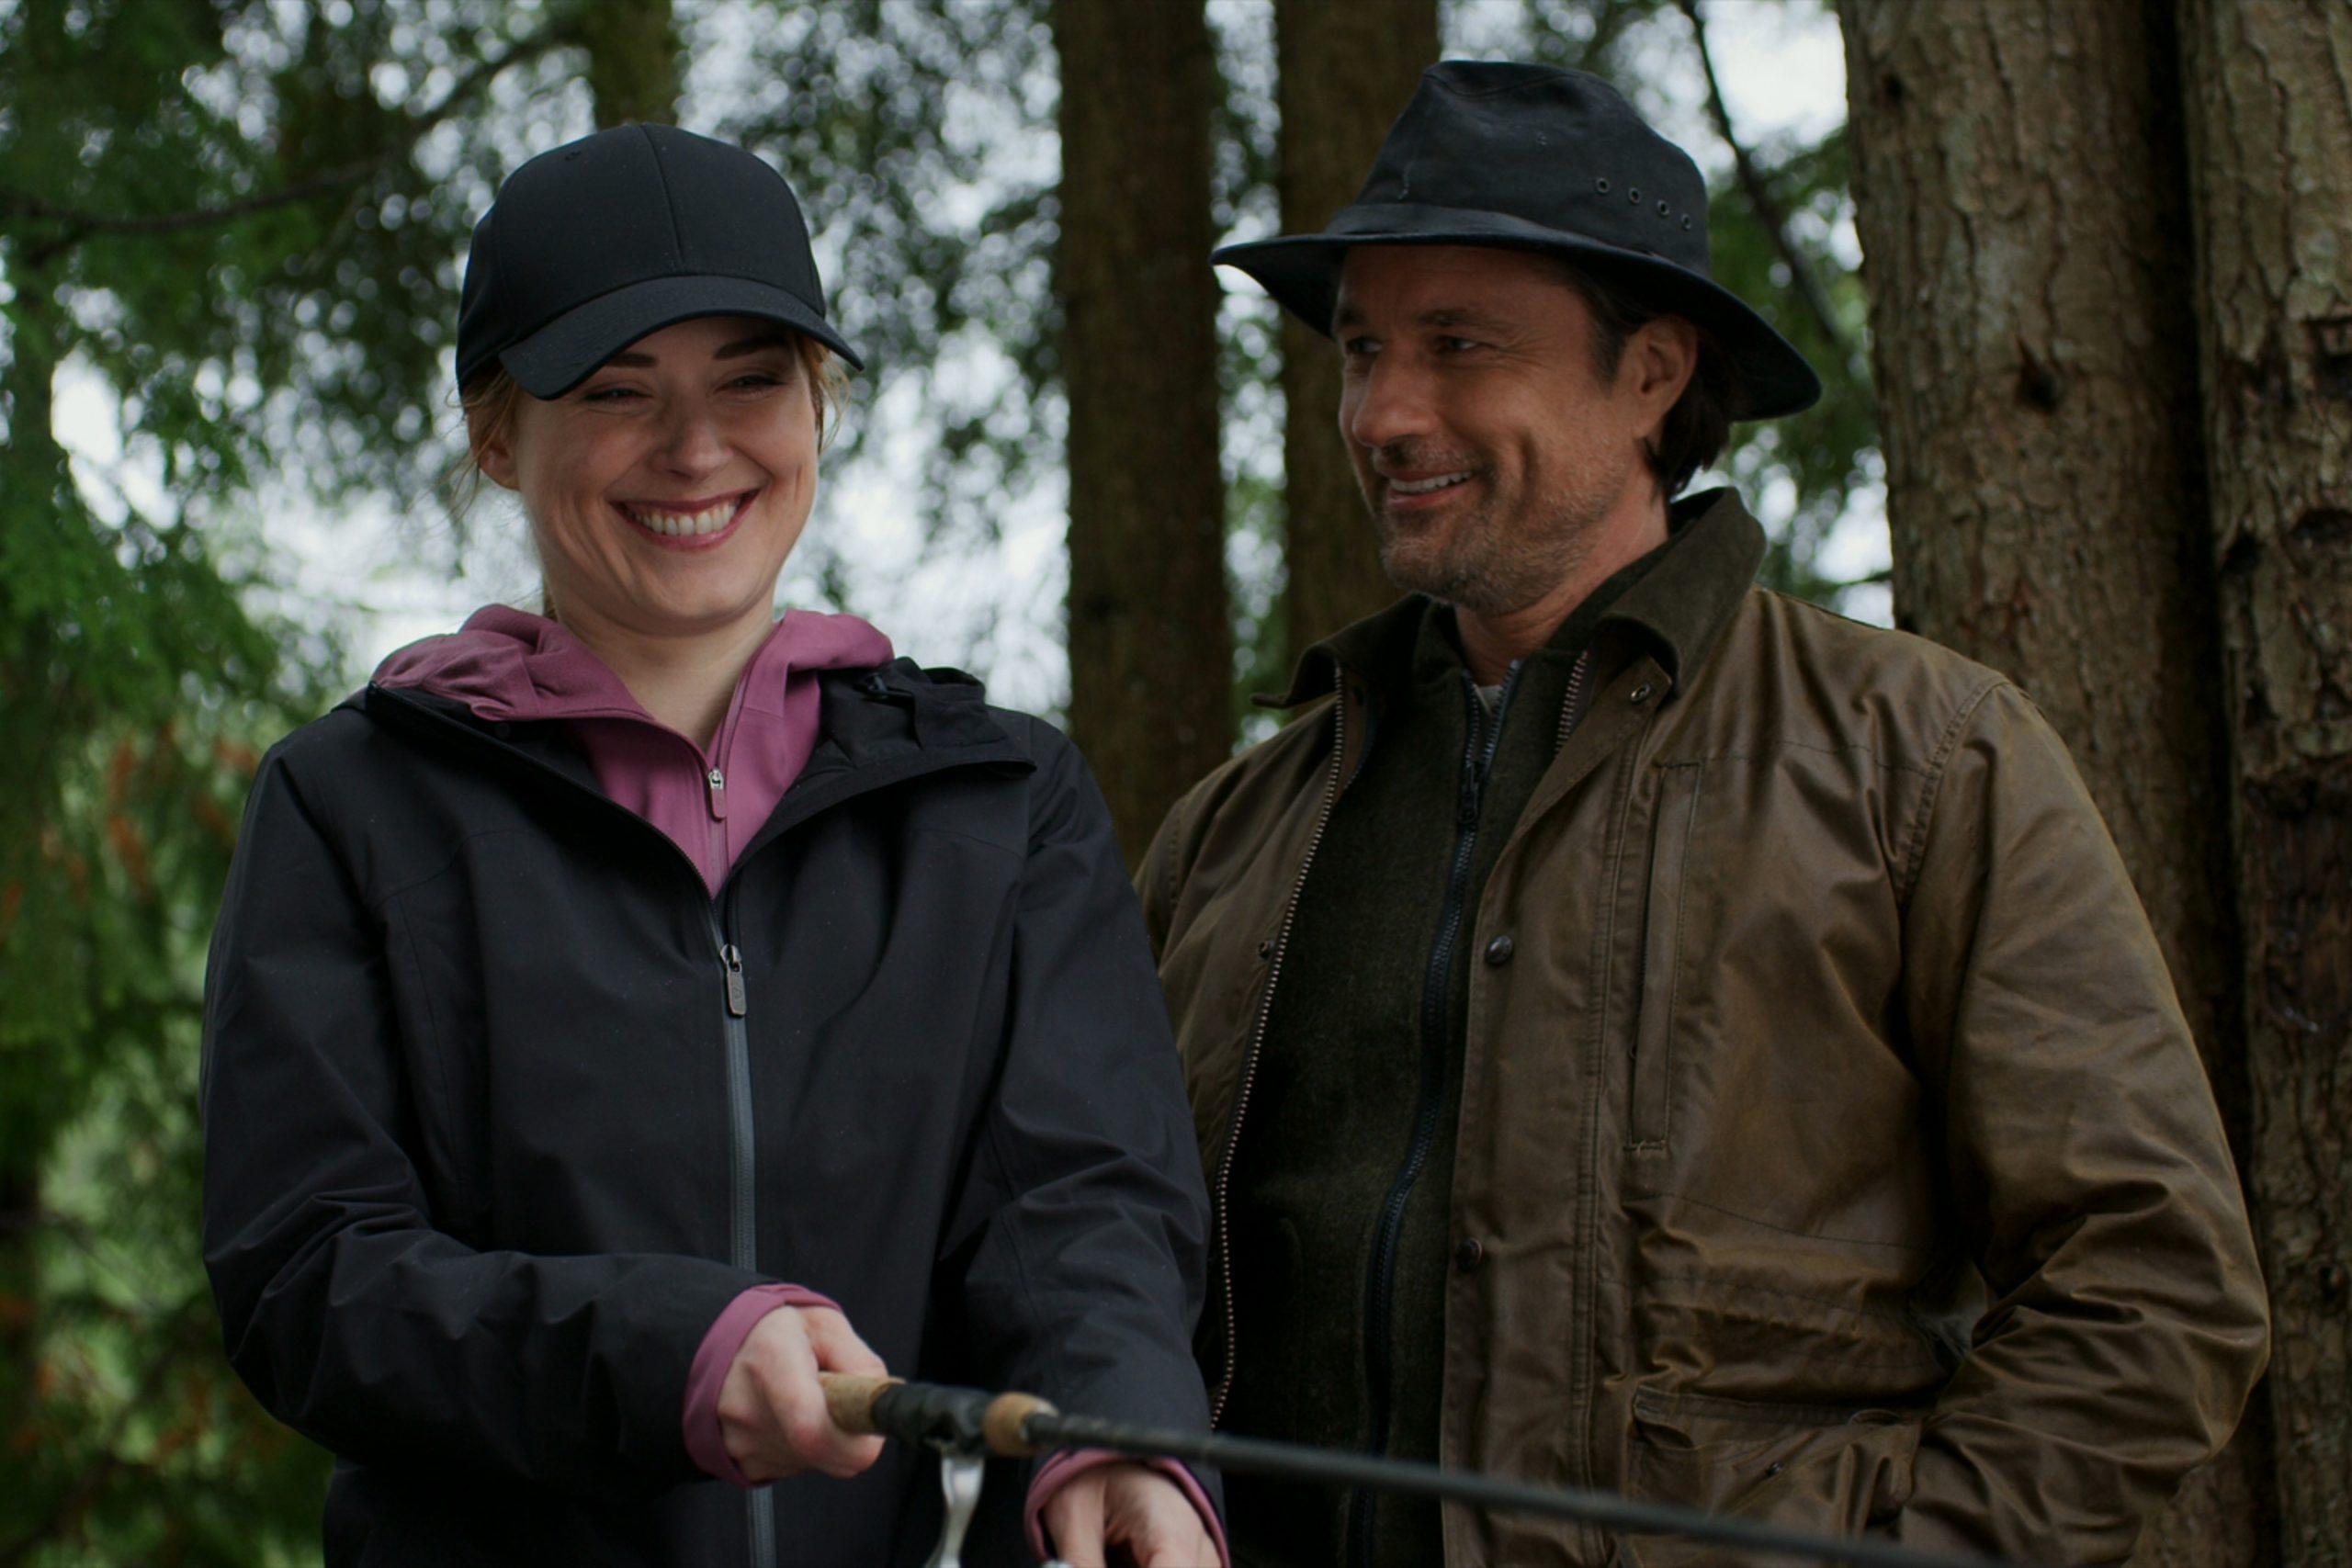 Mel and Jack, both wearing hats, fishing in an episode of 'Virgin River' Season 2.